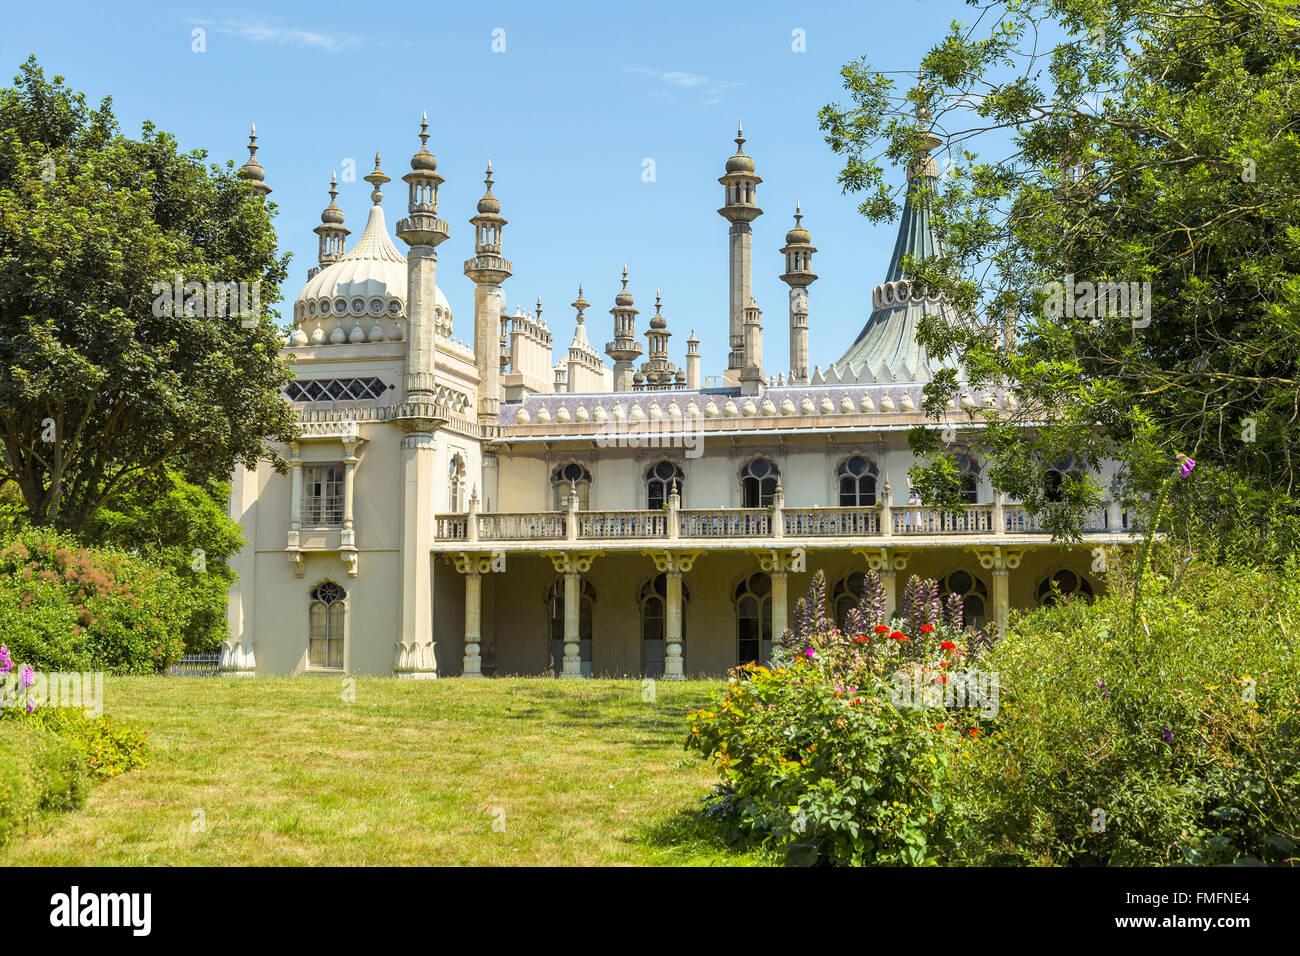 Brighton and Hove regency / Edwardian / Victorian architecture, illustrating it's past. Royal pavilion UK - Stock Image